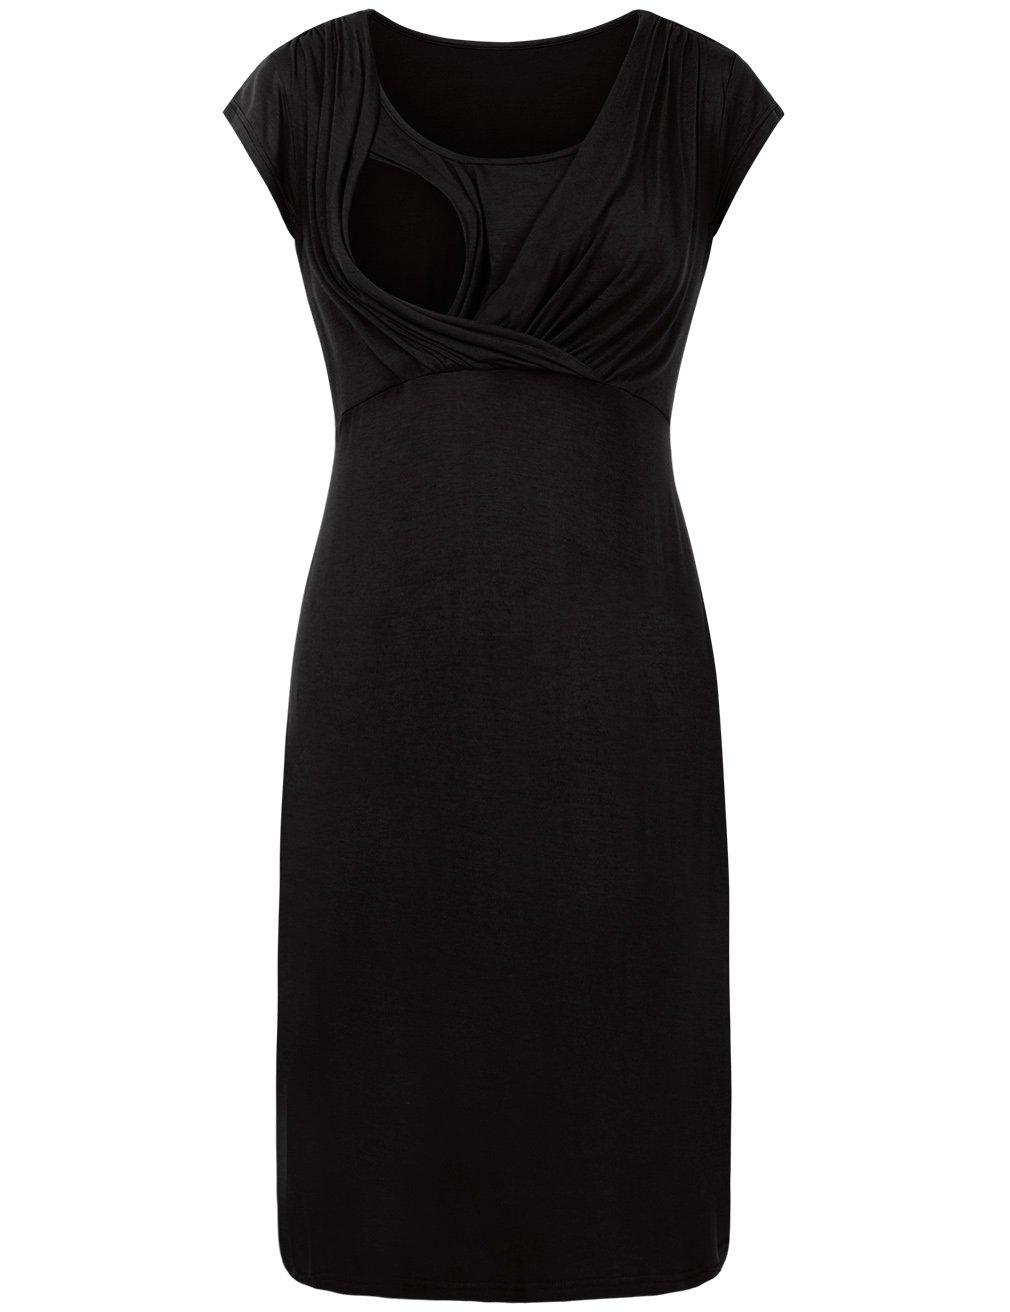 EMVANV Maternity Dress For Women Plus Size, Women Ruched Maternity Dress Casual Short Sleeve Round Collar Dress Black L